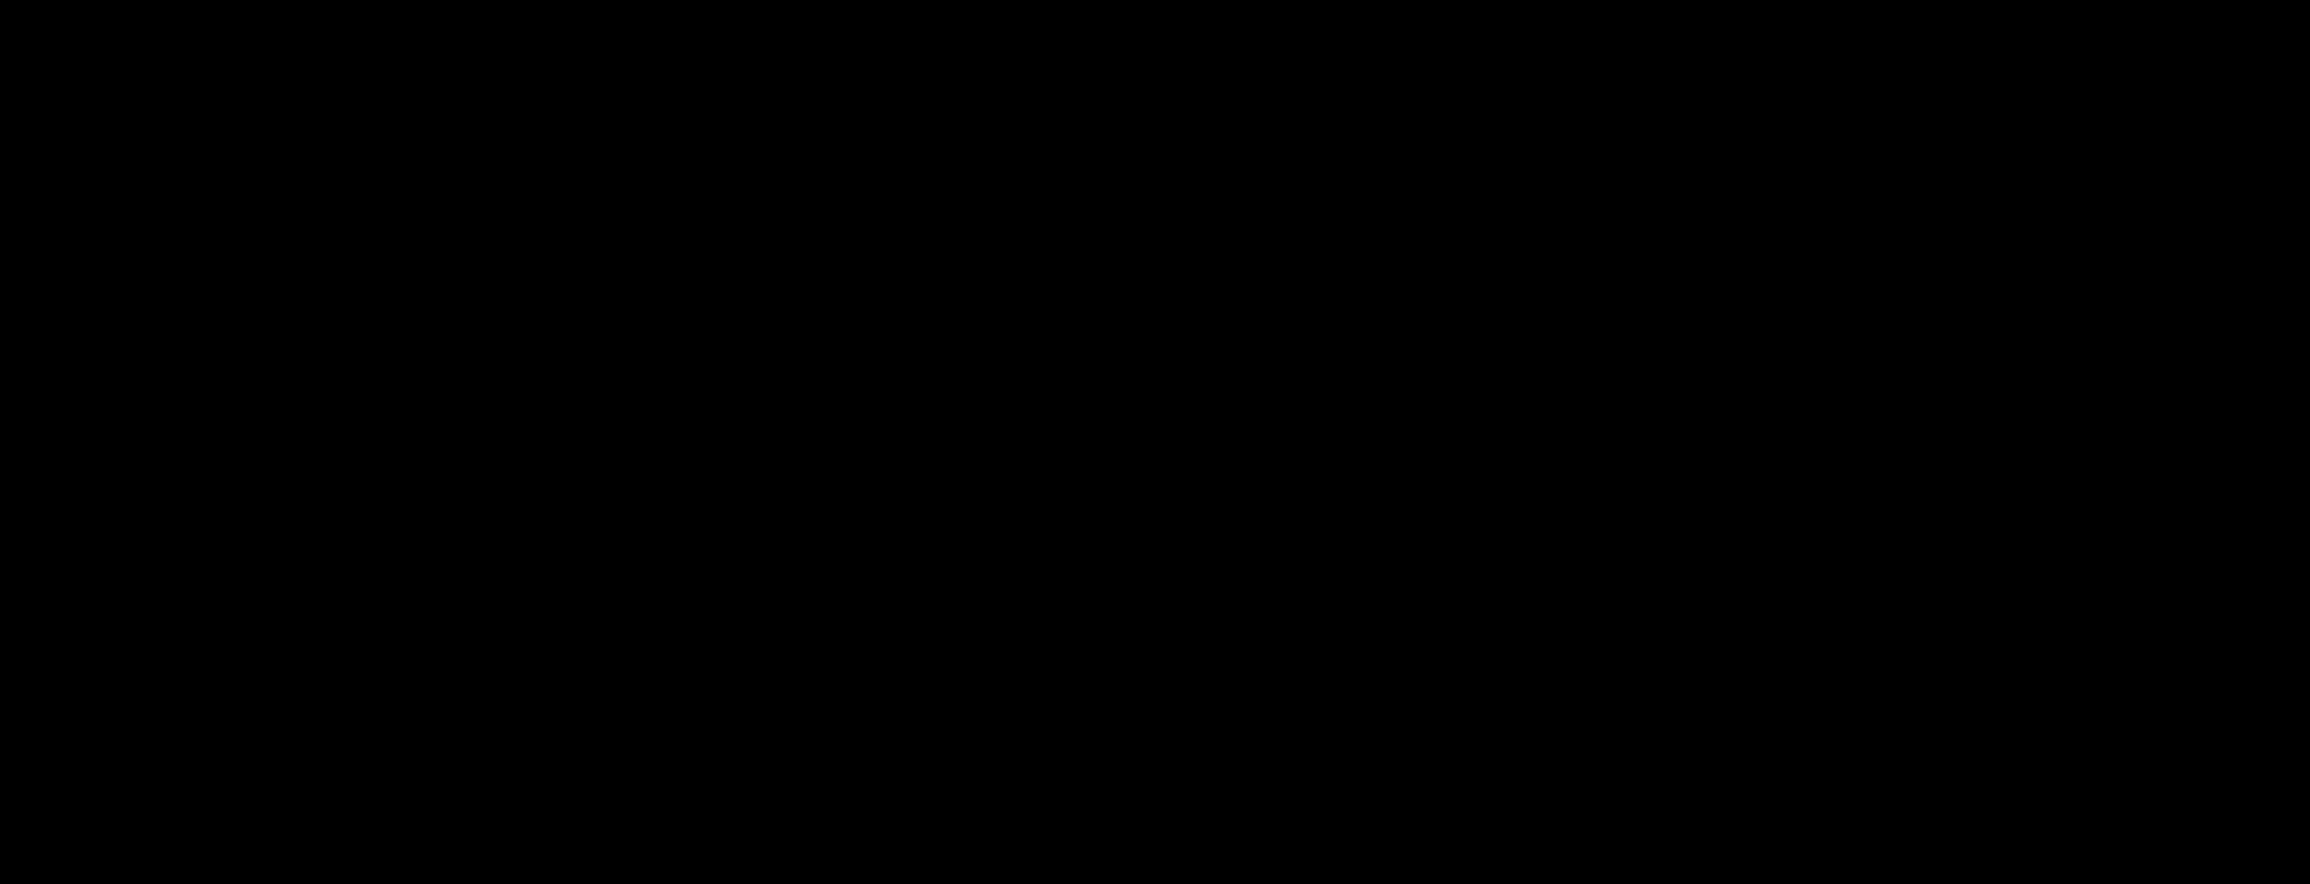 2310x884 Tyrannosaurus Rex Silhouette Icons Png